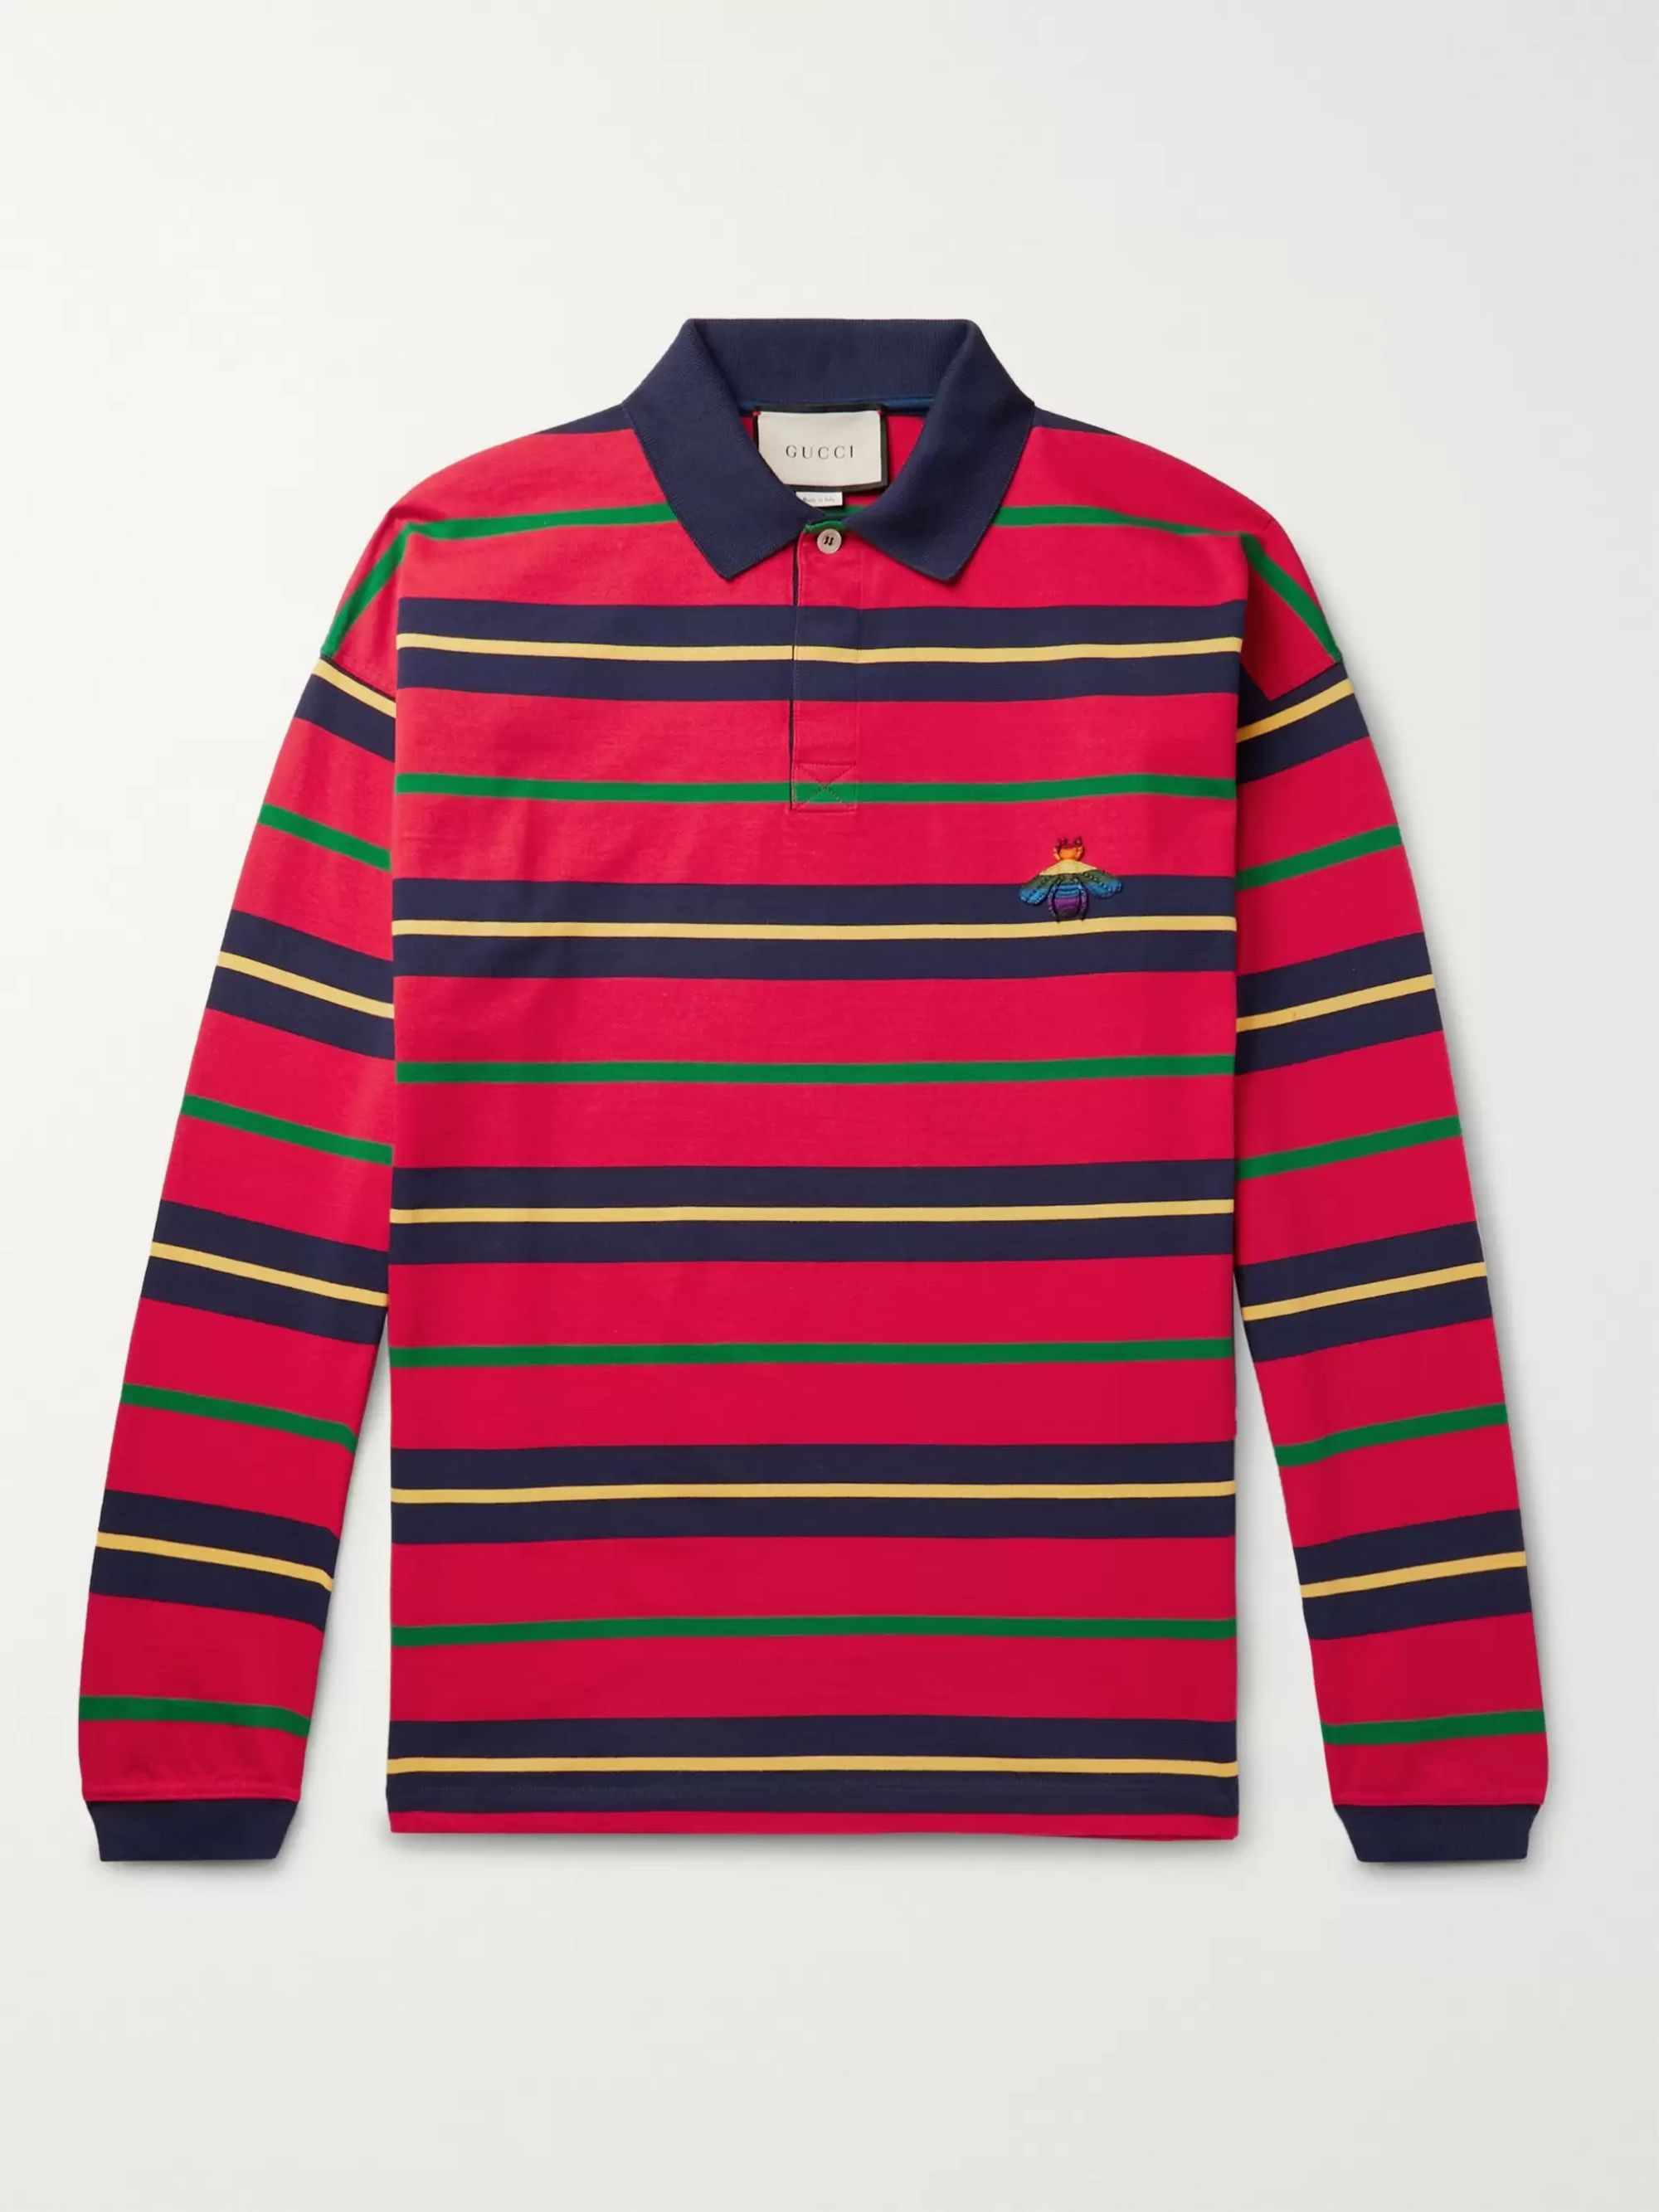 Appliquéd Striped Cotton Jersey Polo Shirt by Gucci